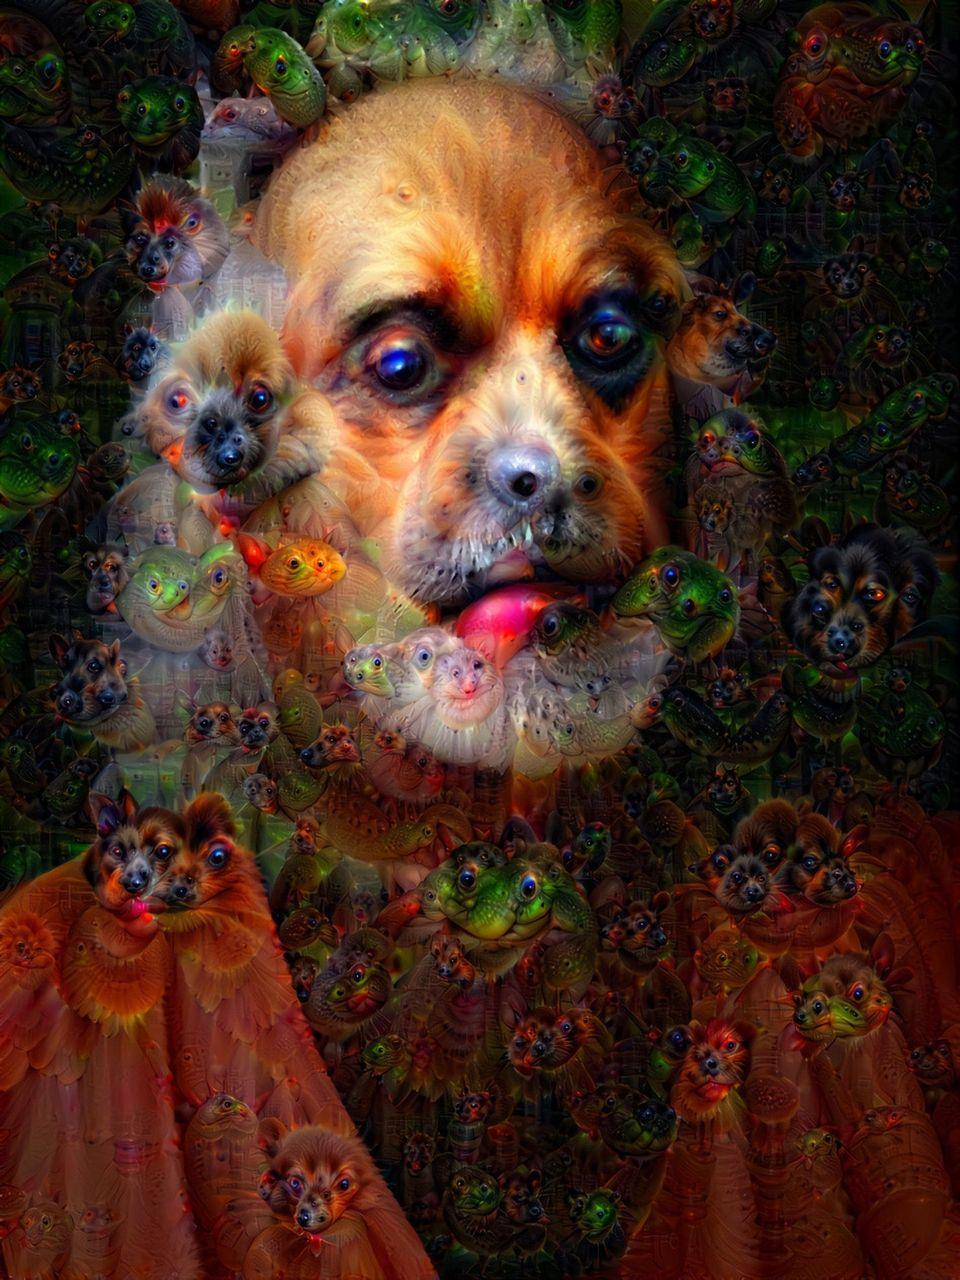 Late Night Selfie - 5811105015fab895ed174bc766c85fd28477c13e.jpg